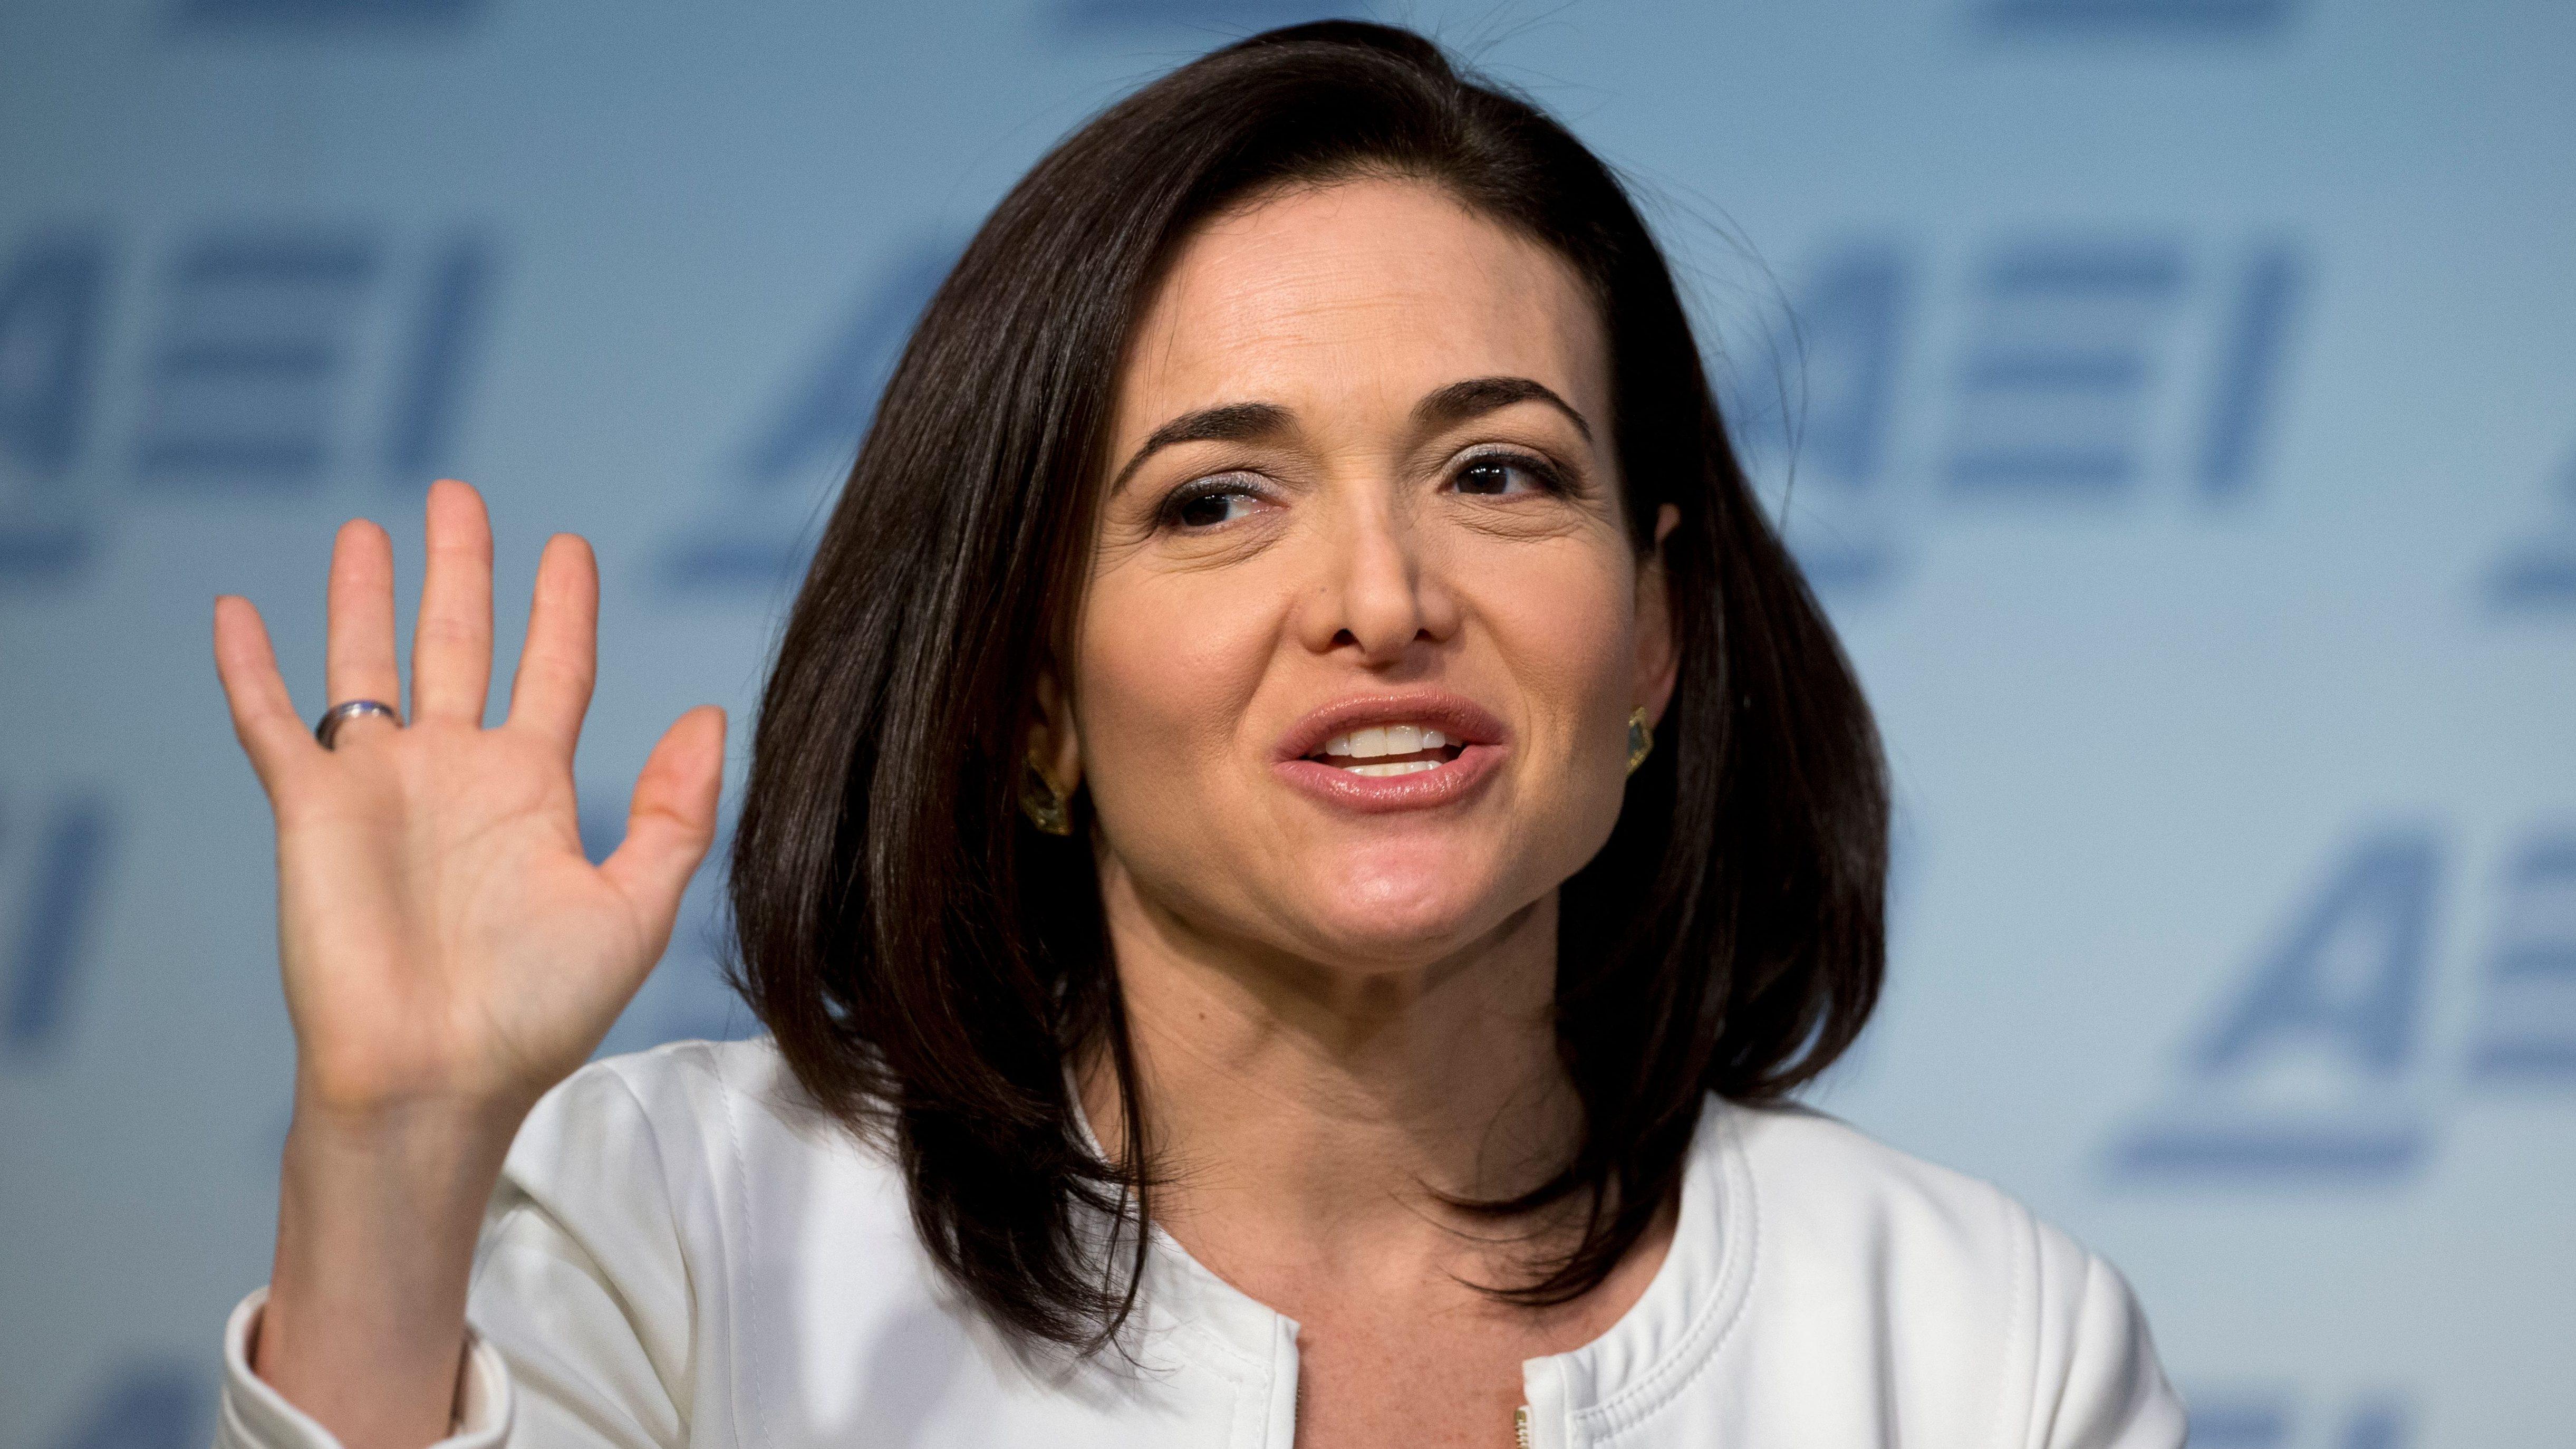 Who is the Sheryl Sandberg depicted in the New York Times ... Sheryl Sandberg Hobbies